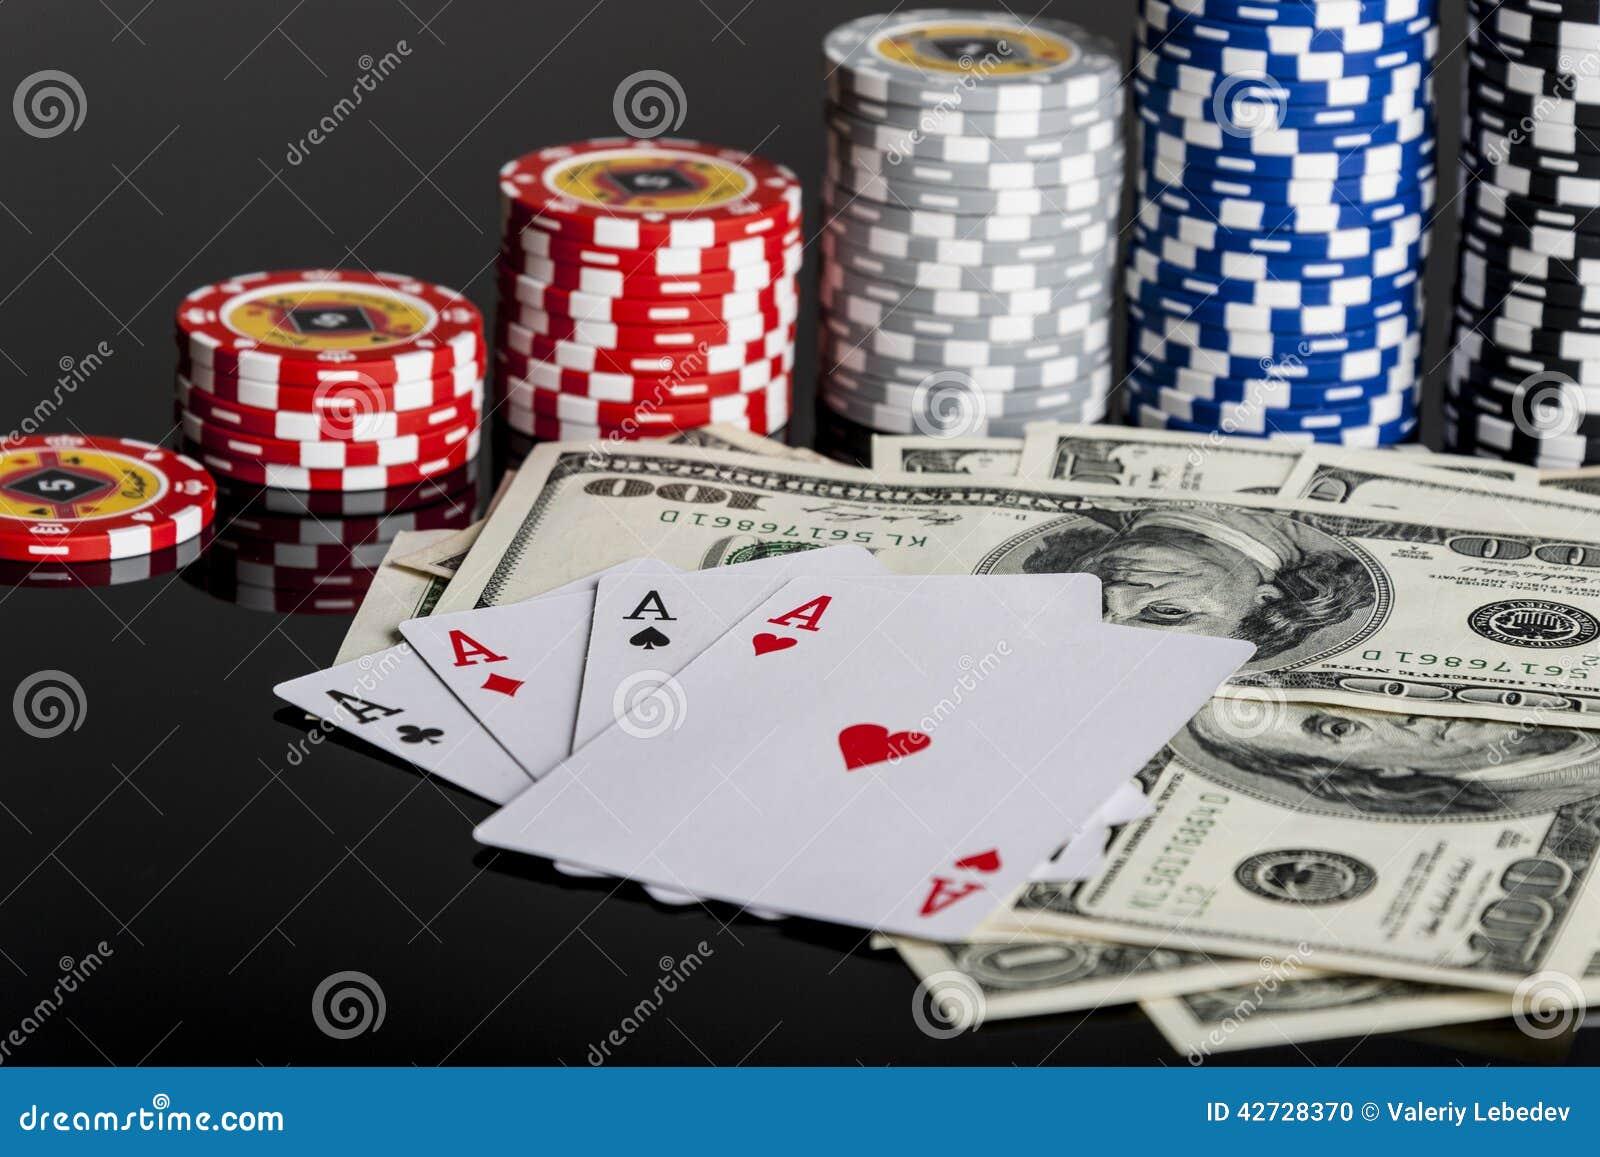 morongo casino rooms